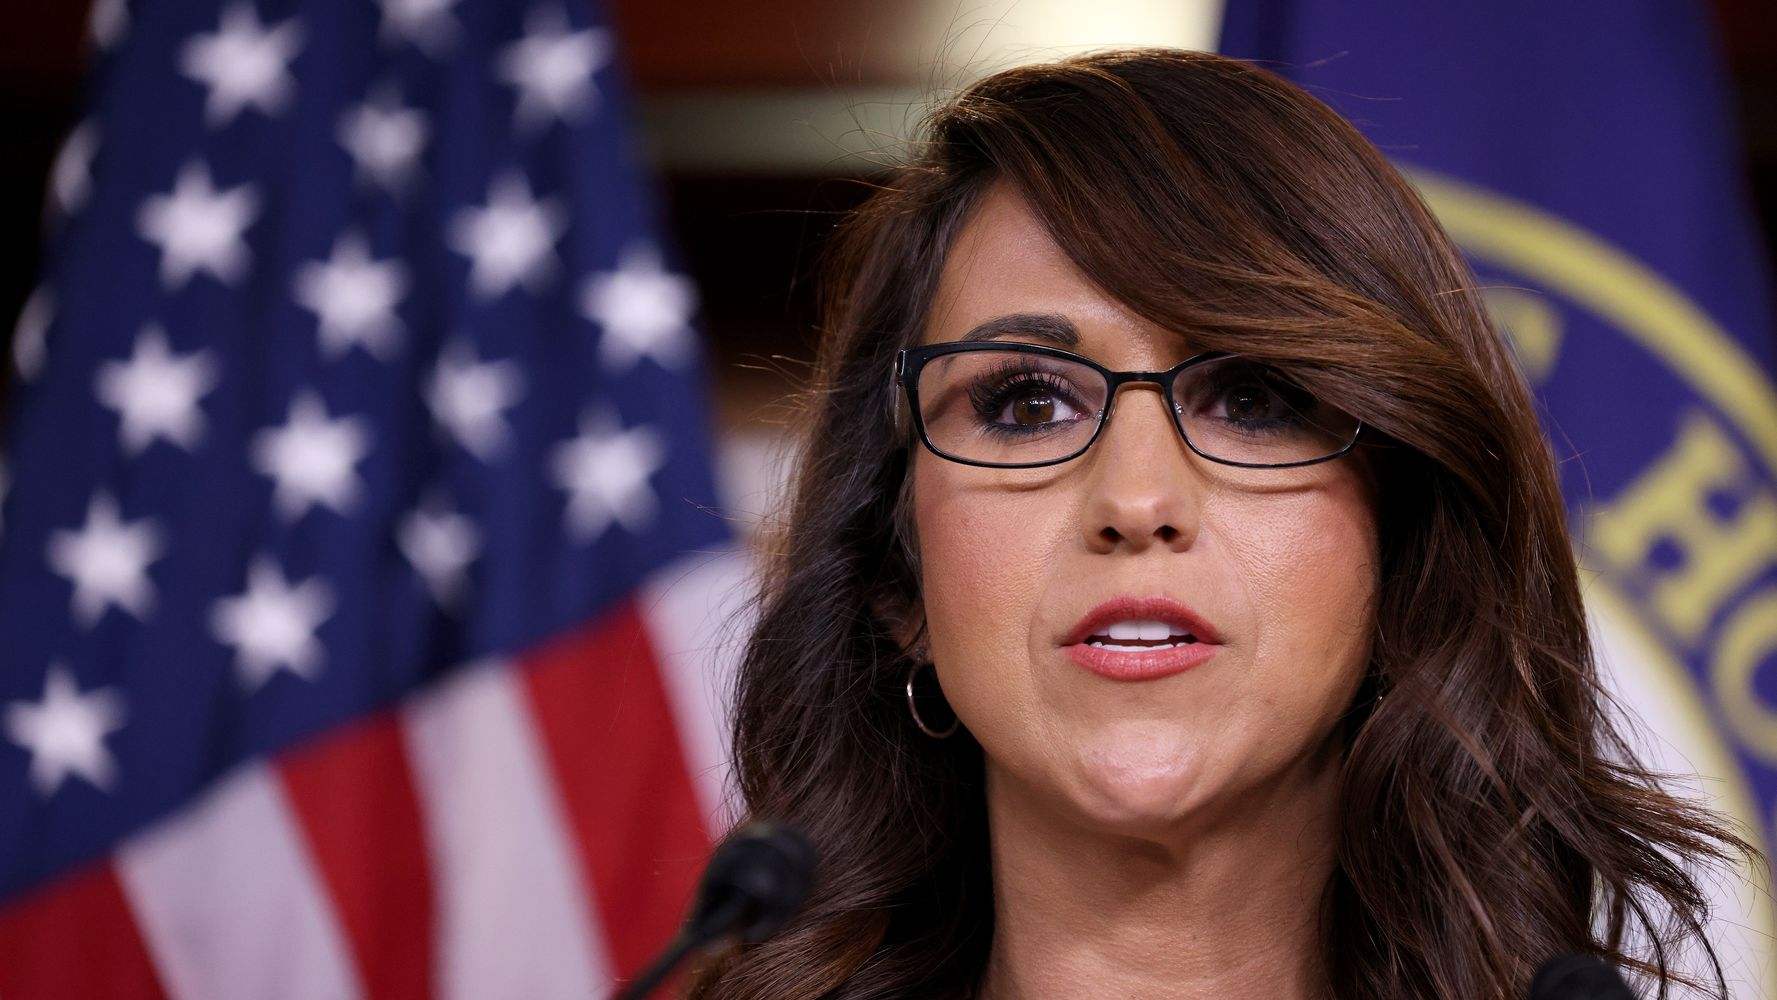 Lauren Boebert Calls For Joe Biden's 'Imeachment'